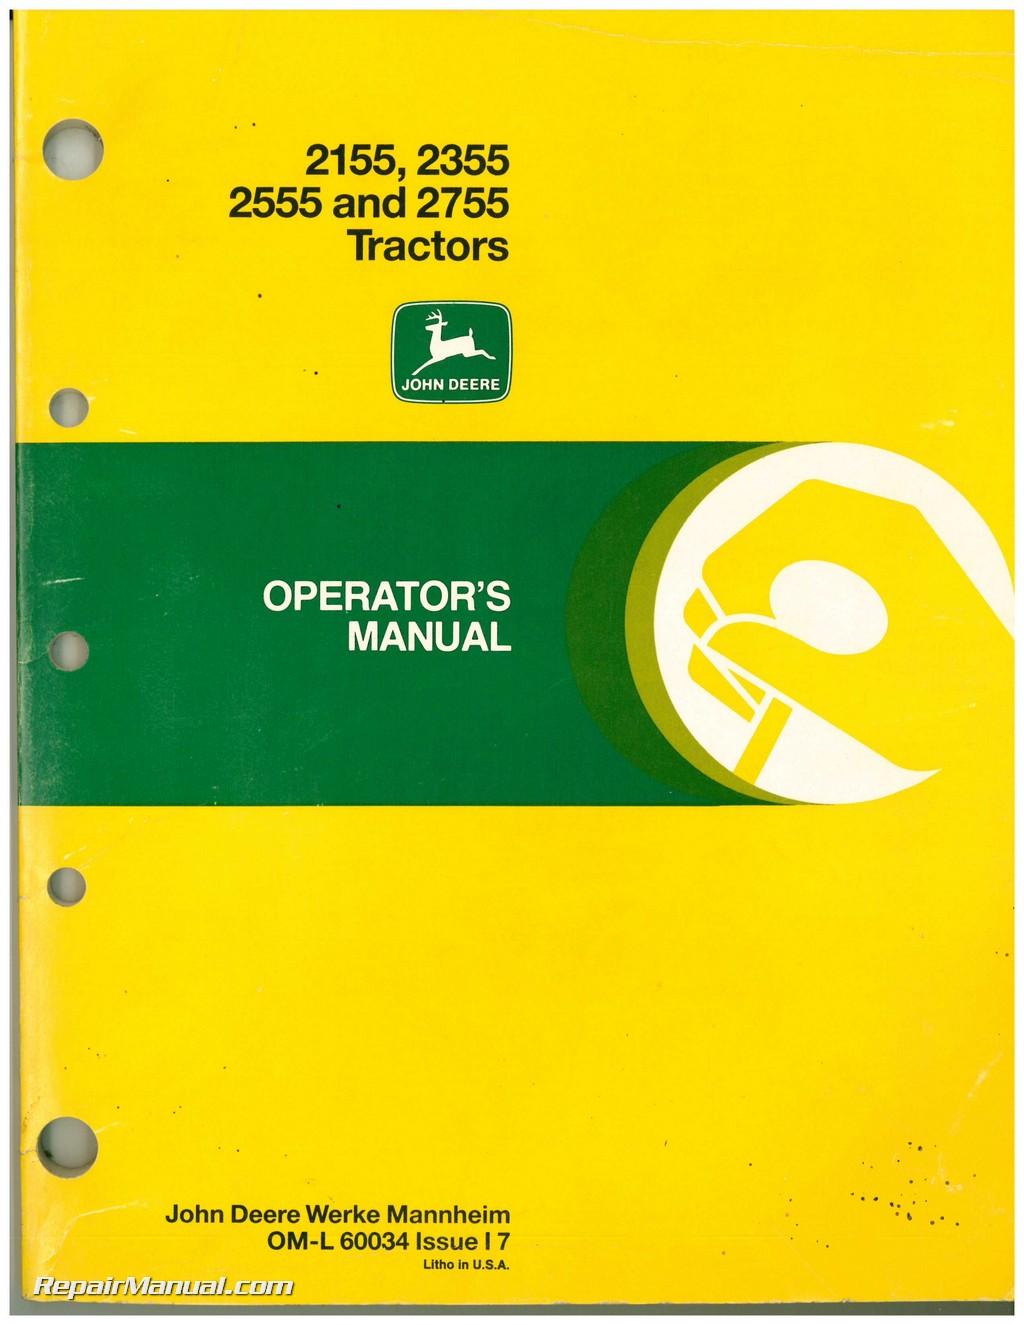 John Deere 2555 Operator Manual 2355 Wiring Diagram 2155 And 2755 Tractors Operators Rh Repairmanual Com Lawn Tractor Manuals Service